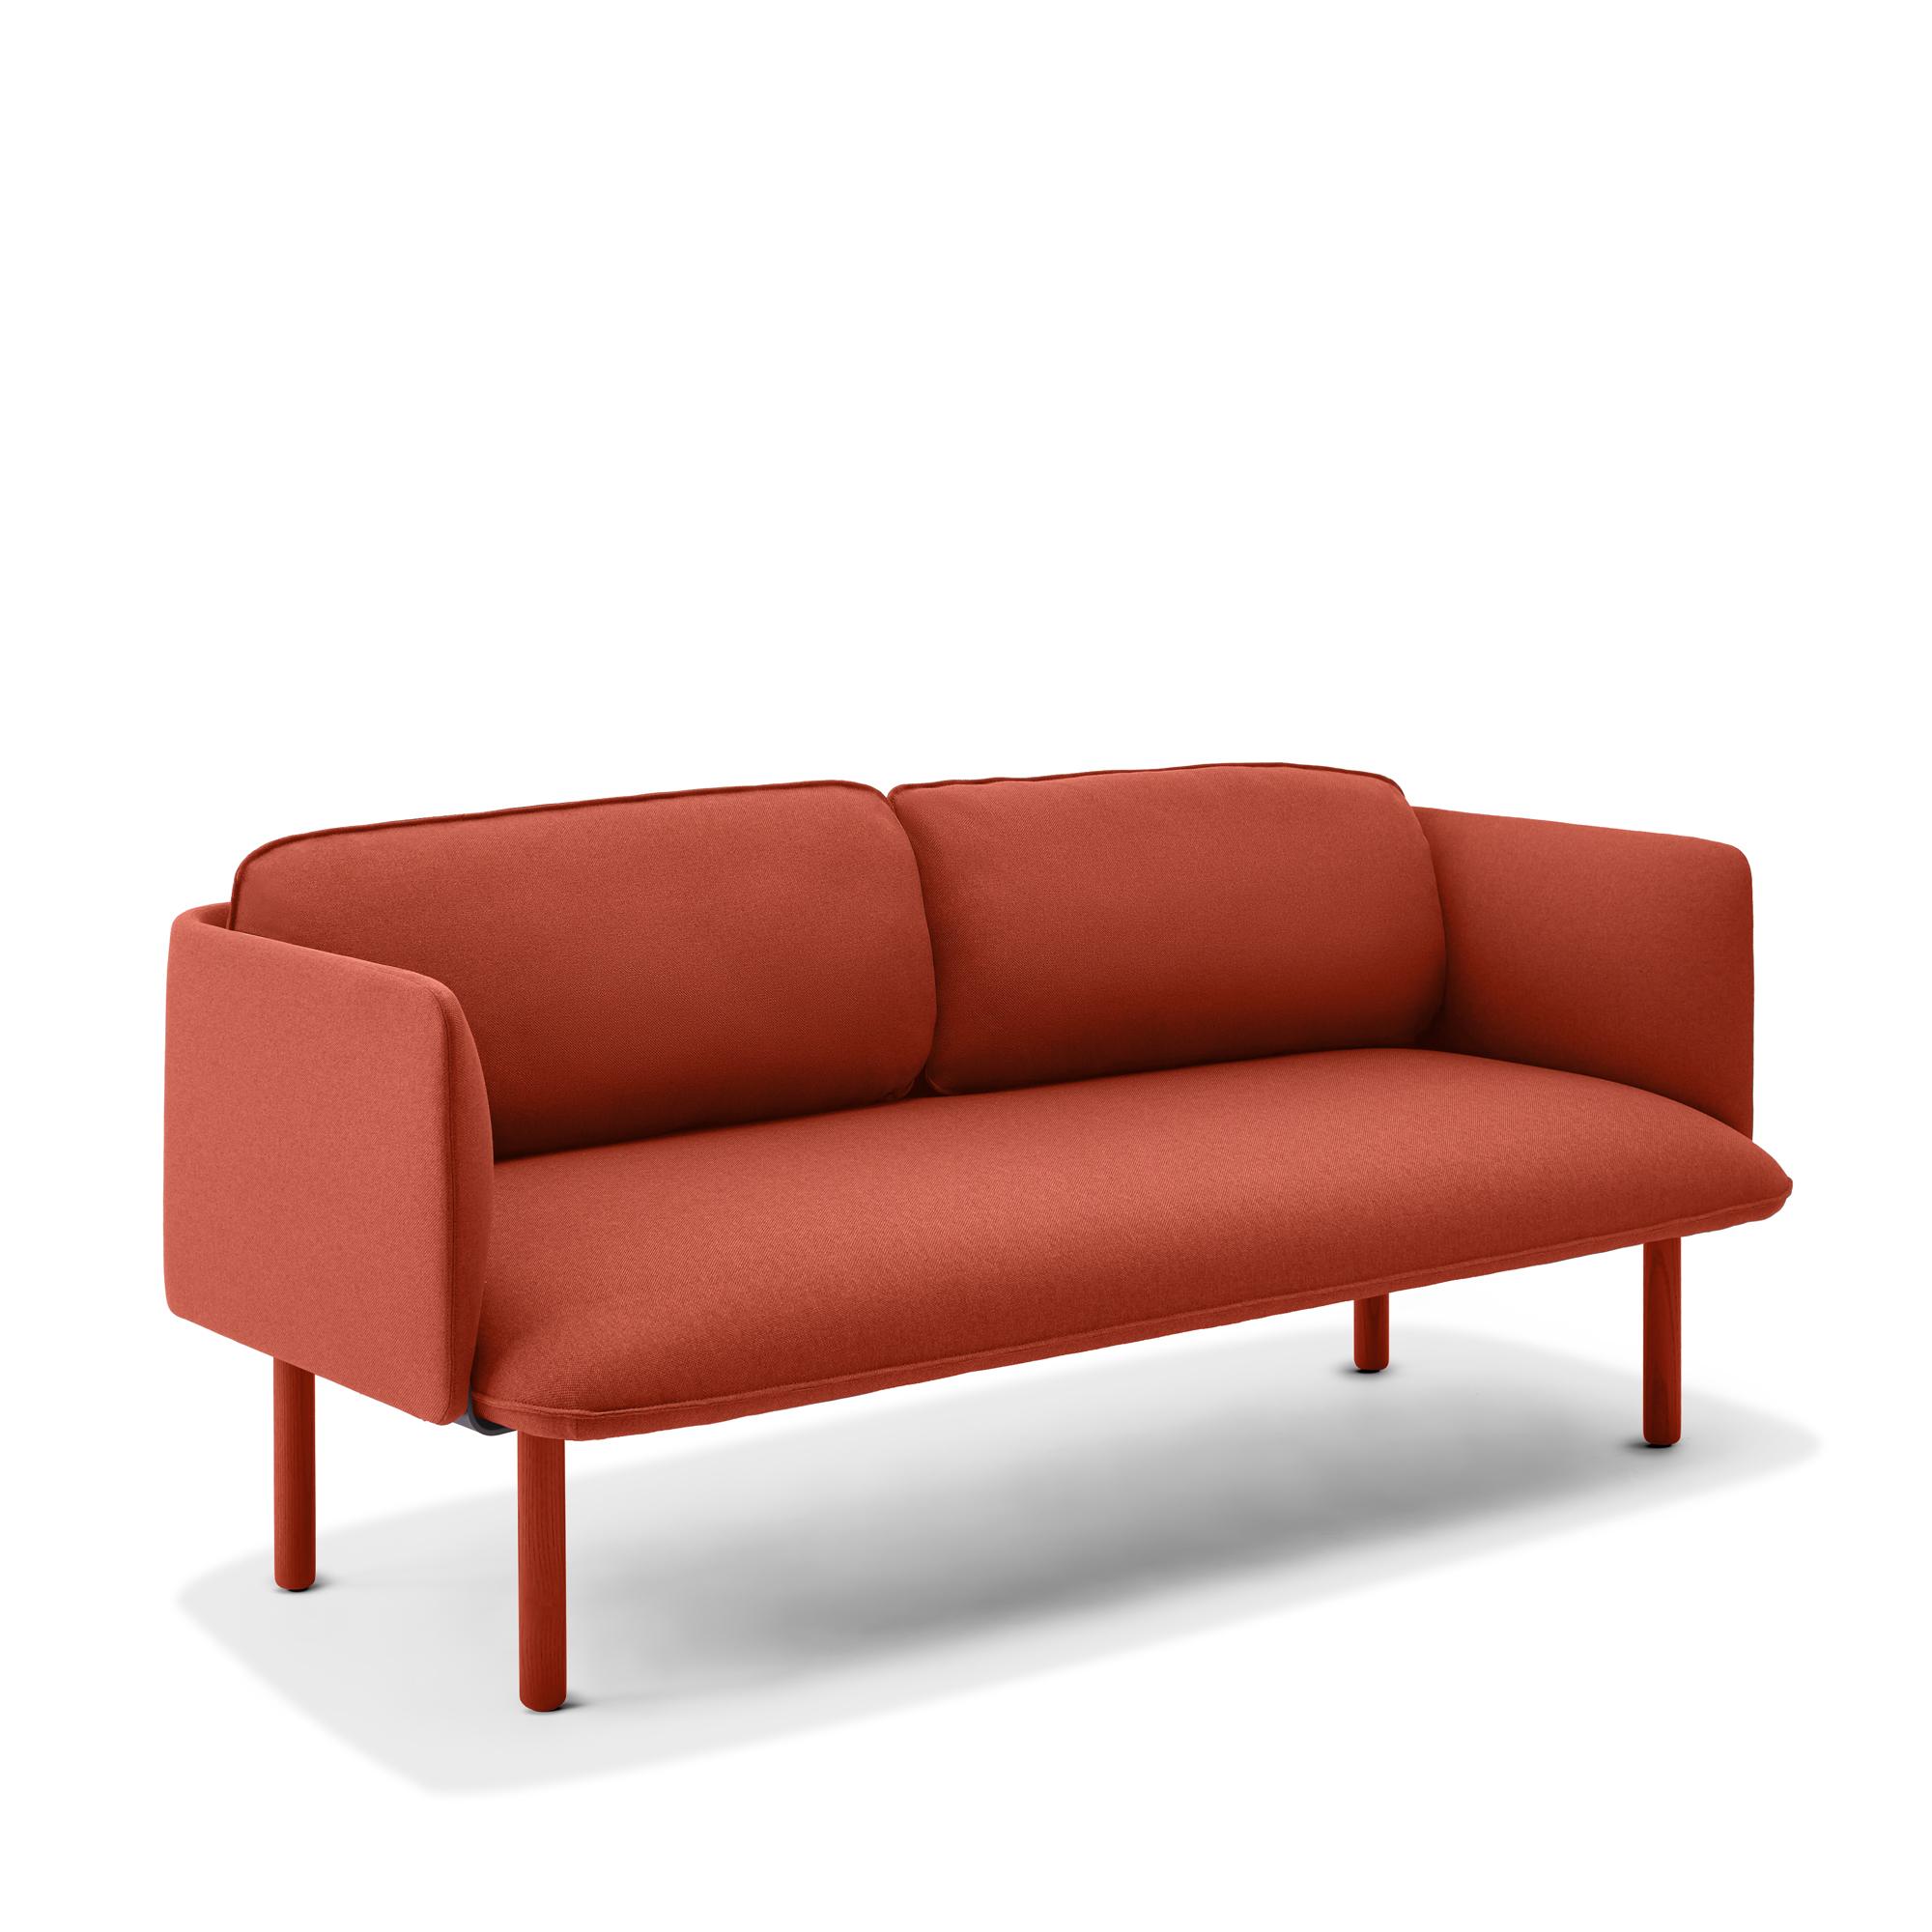 Brick QT Lounge Low Sofa | Modern Lounge Furniture | Poppin